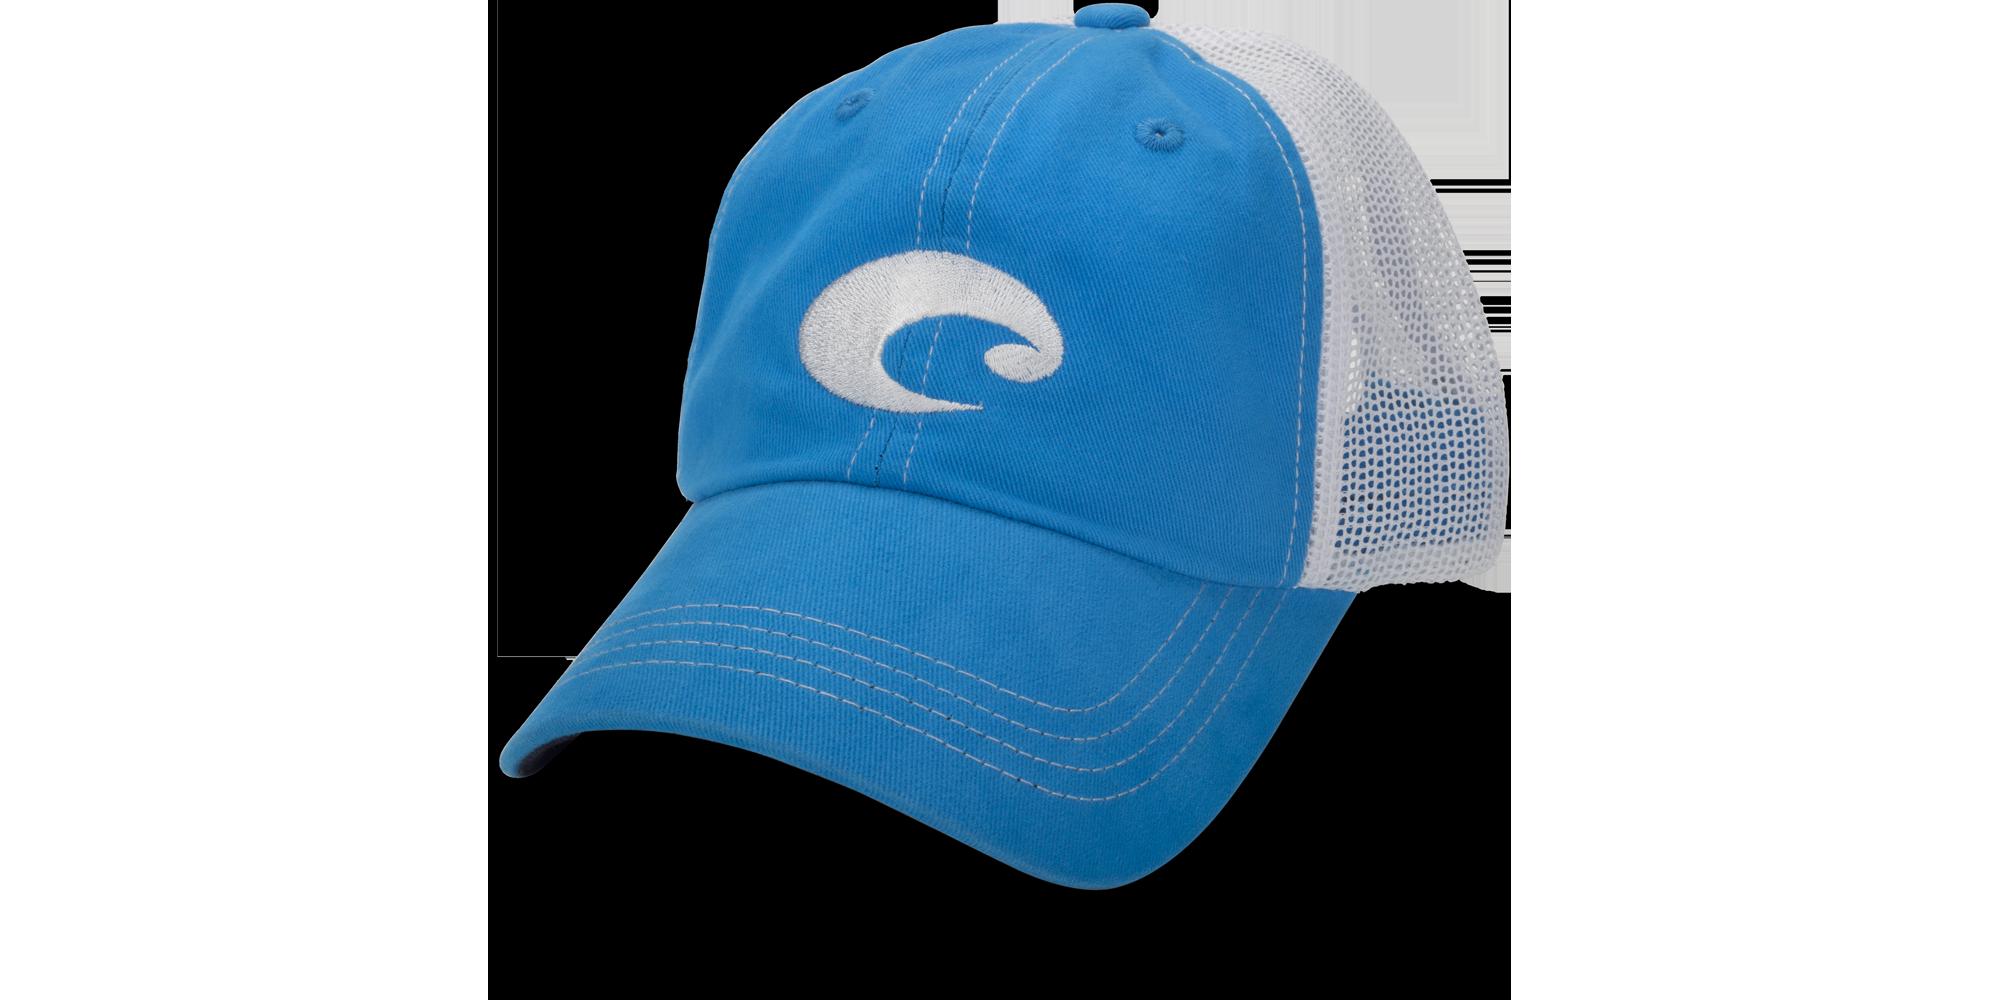 HOT HOT BRAND NEW COSTA DEL MAR MESH LOGO ADJUSTABLE CAP HAT SLATE BLUE STONE